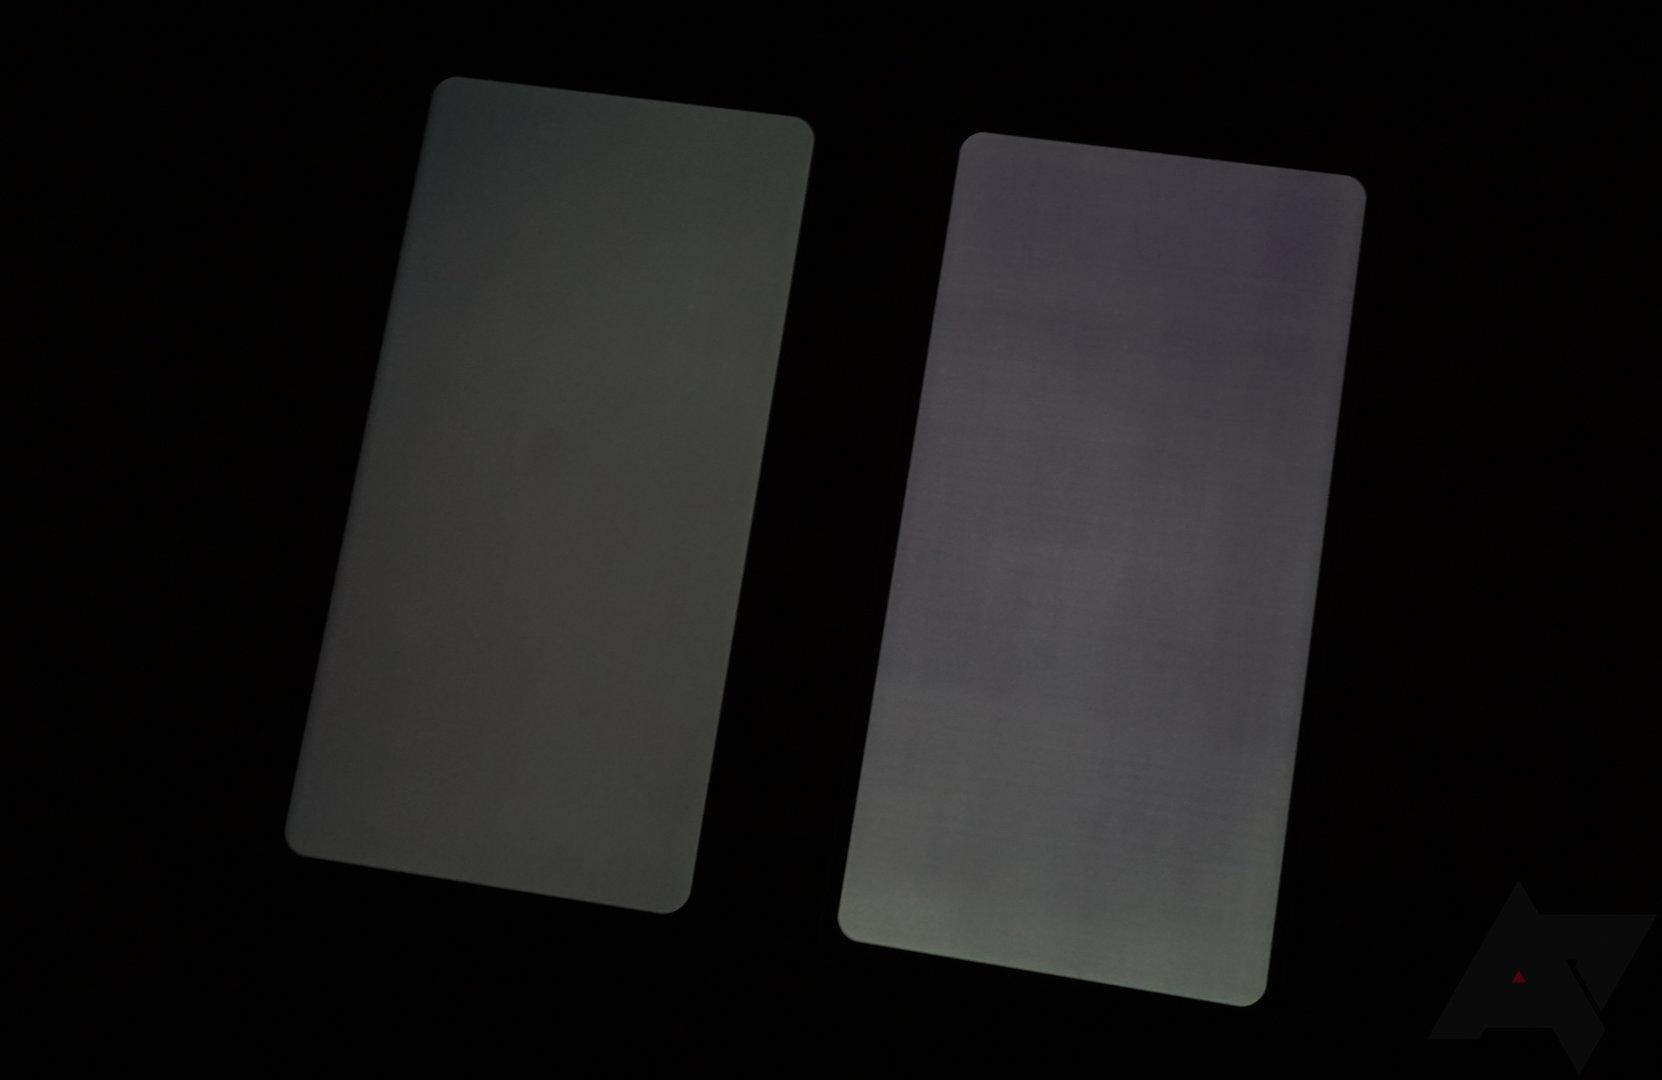 Kaum betroffenes Pixel 2 XL (links) neben LG V30 (rechts)